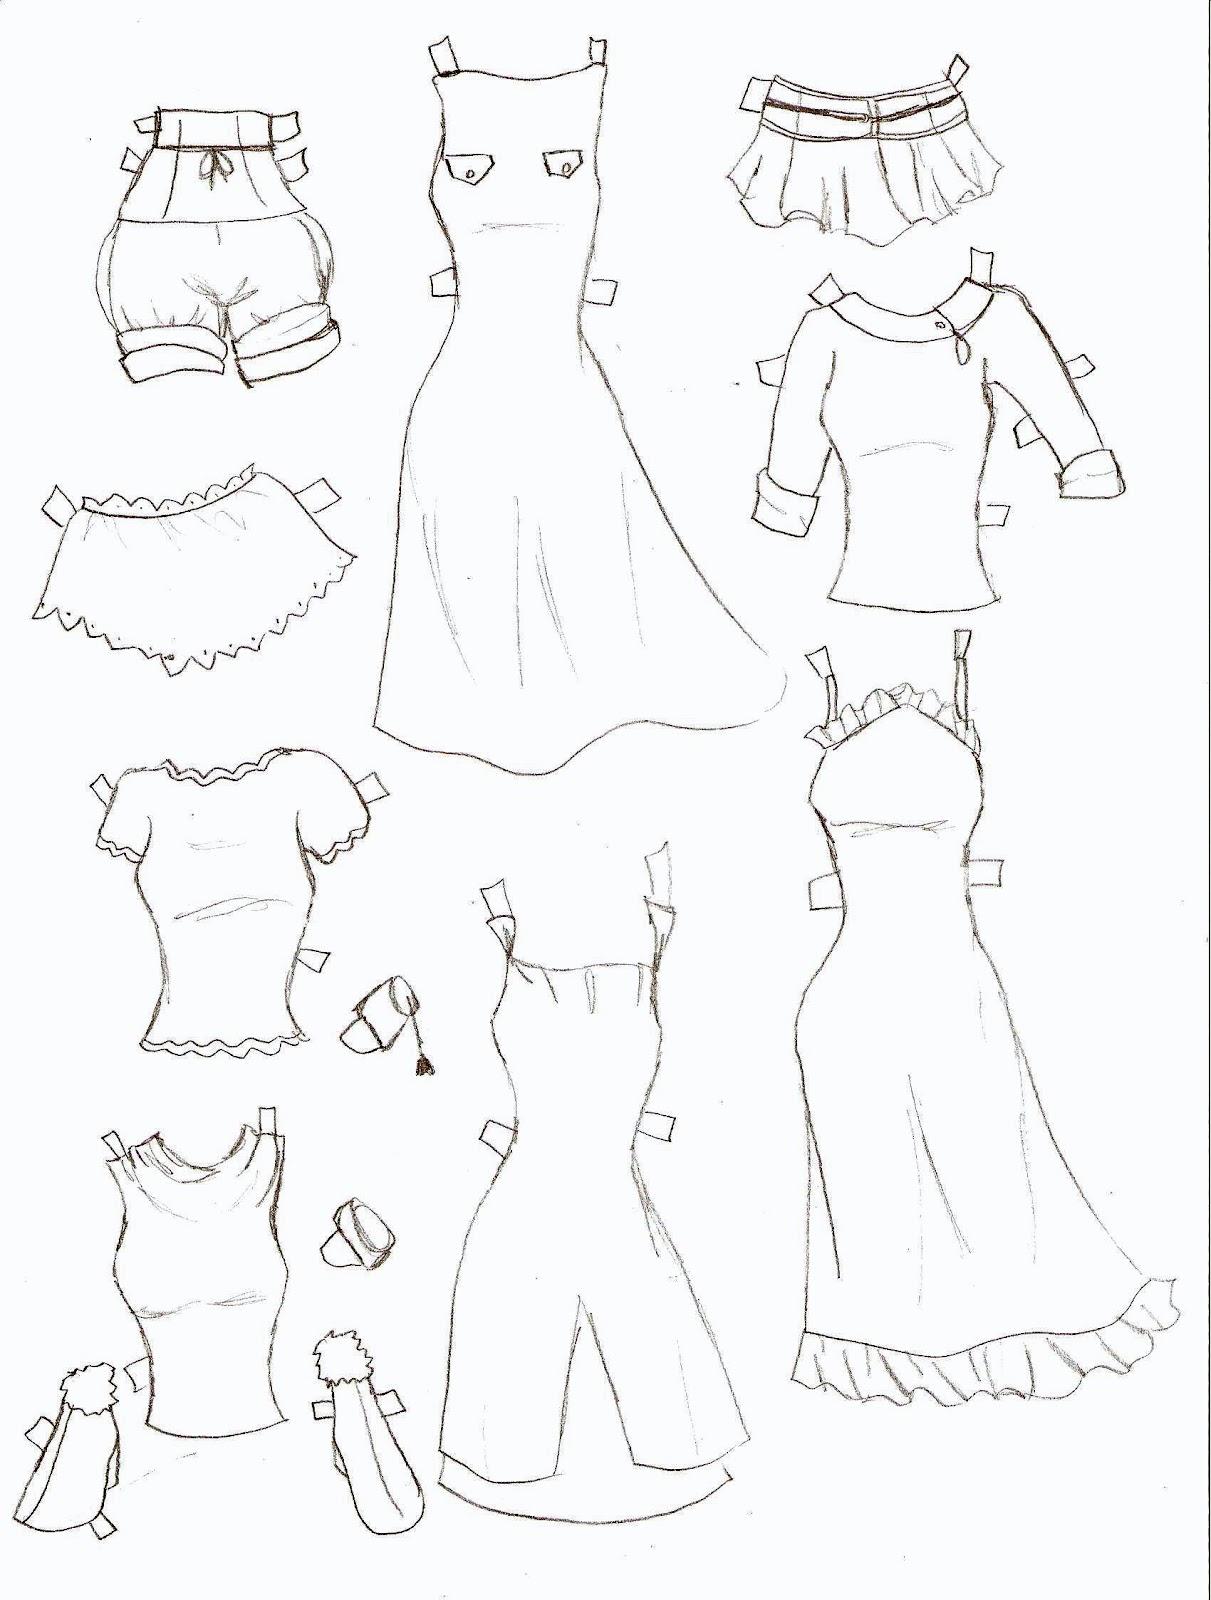 How to draw anime girl shirts